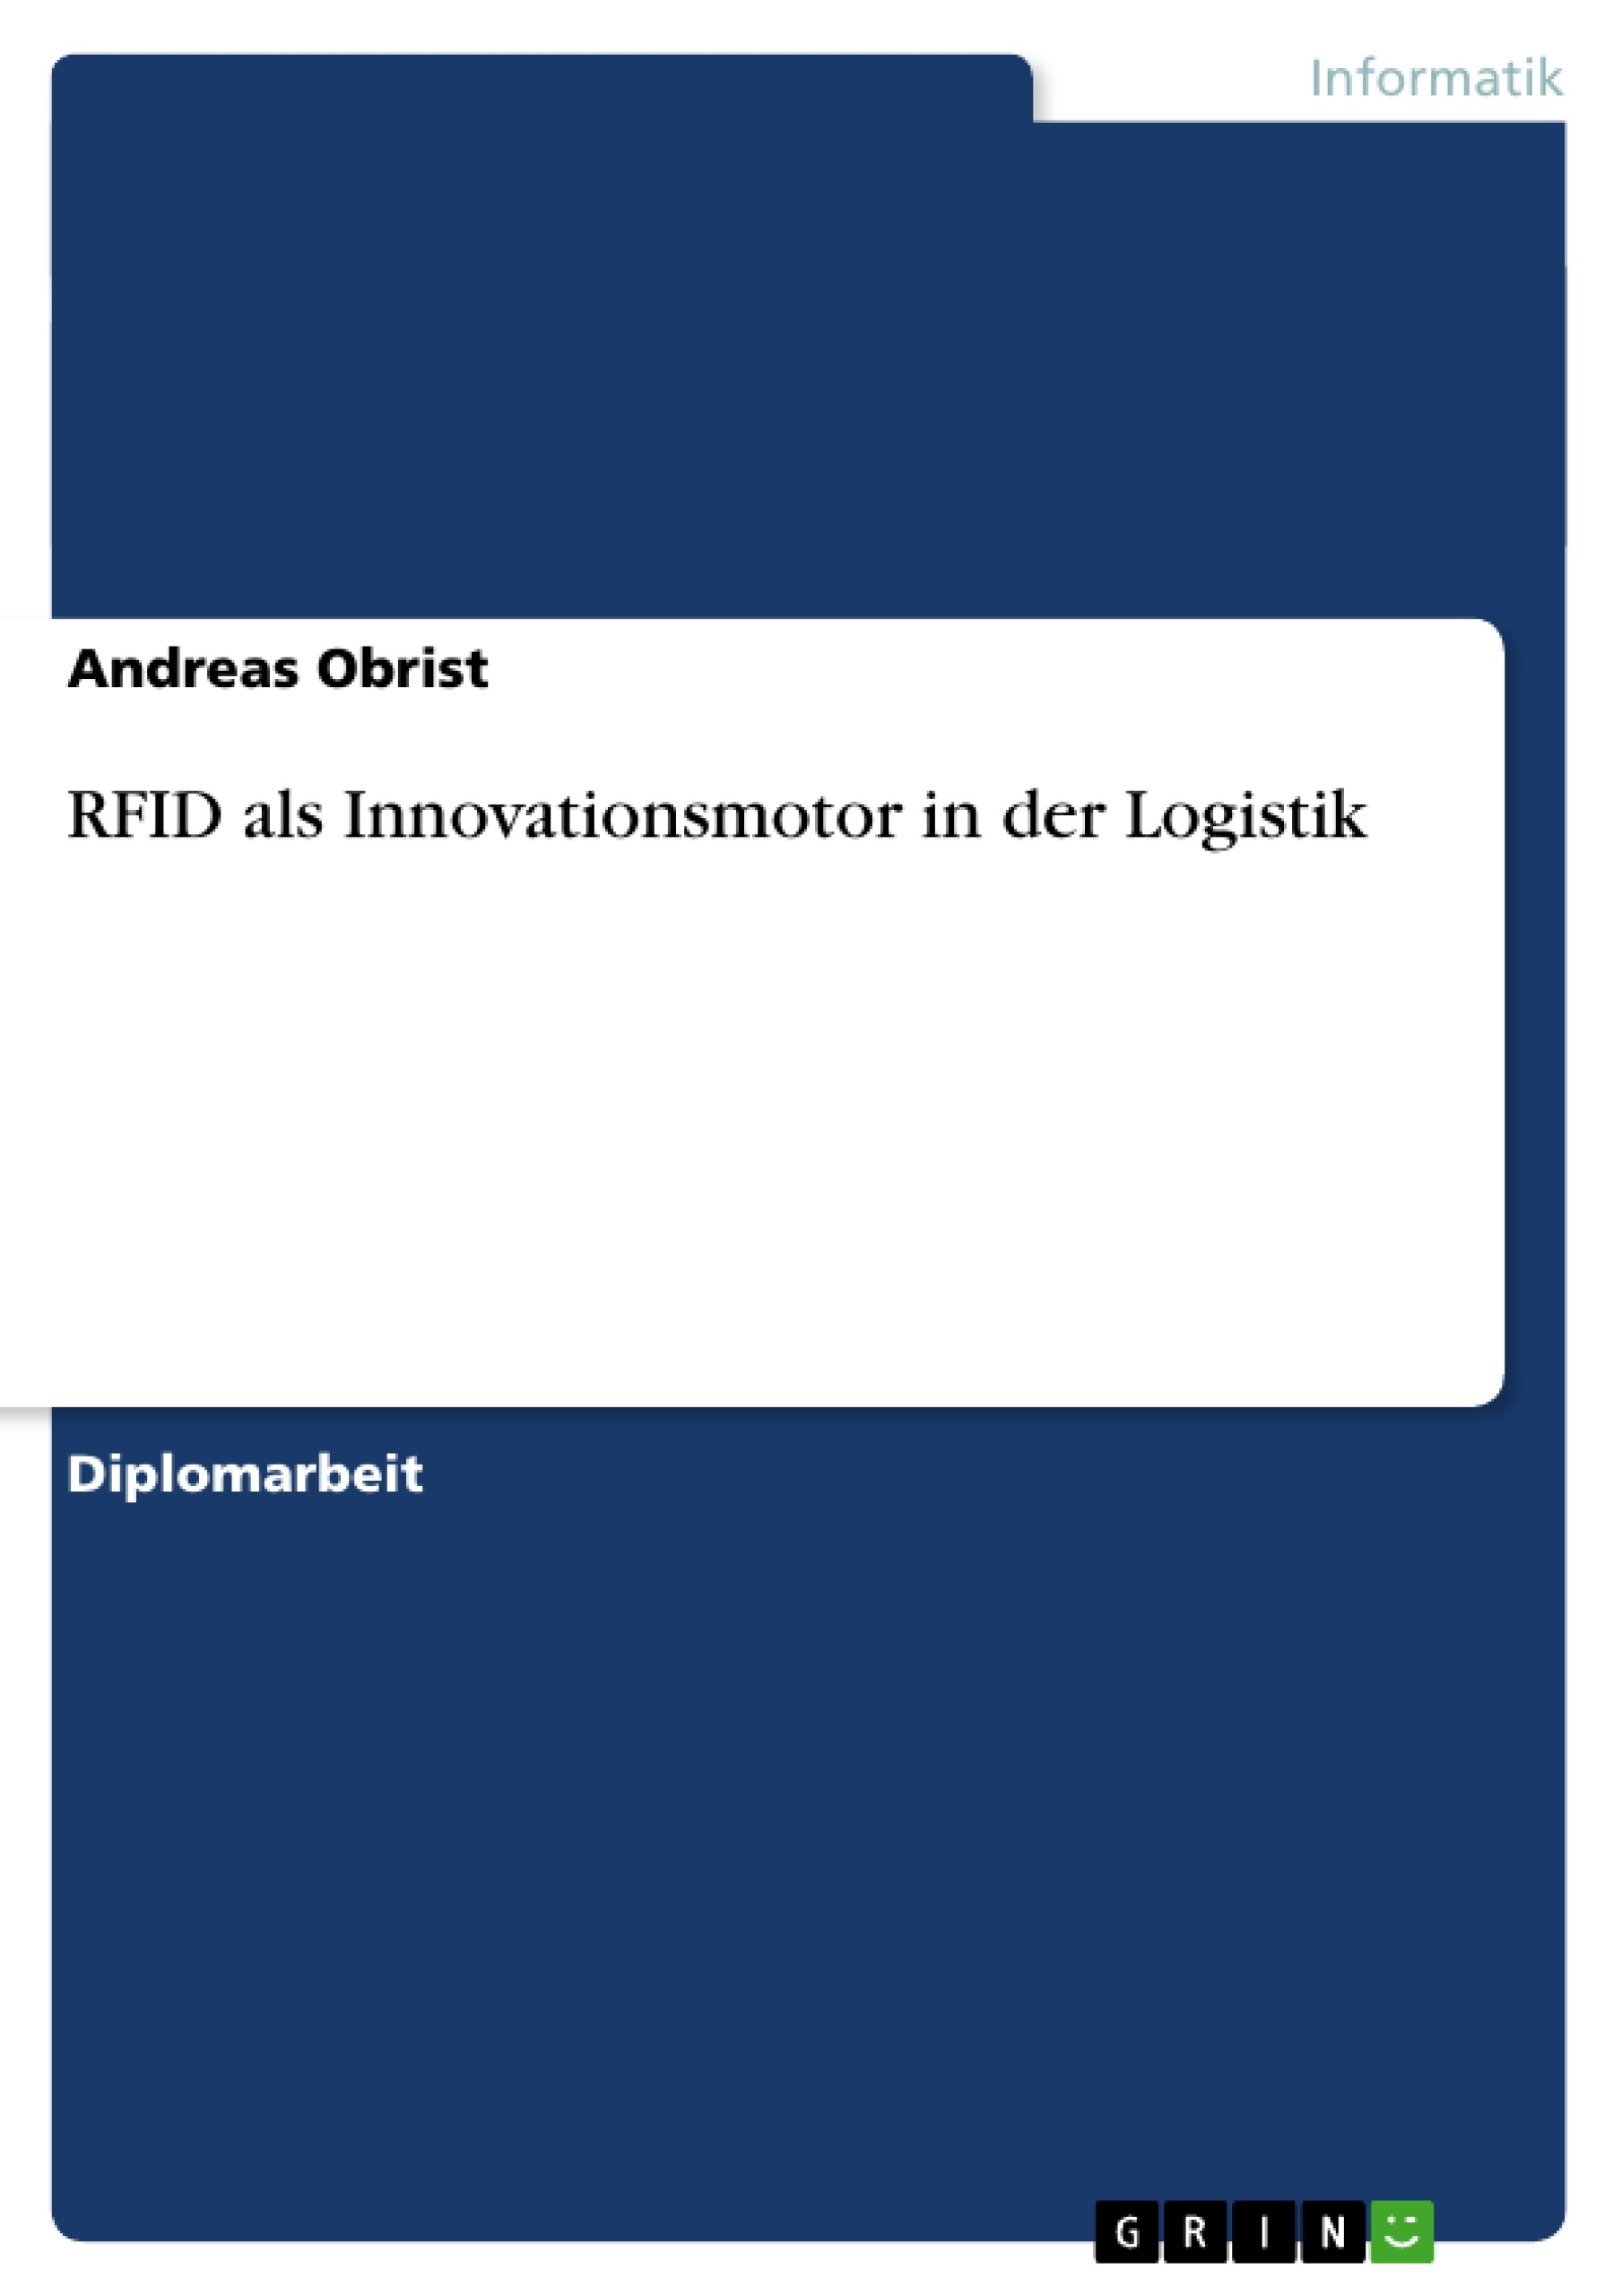 Titel: RFID als Innovationsmotor in der Logistik